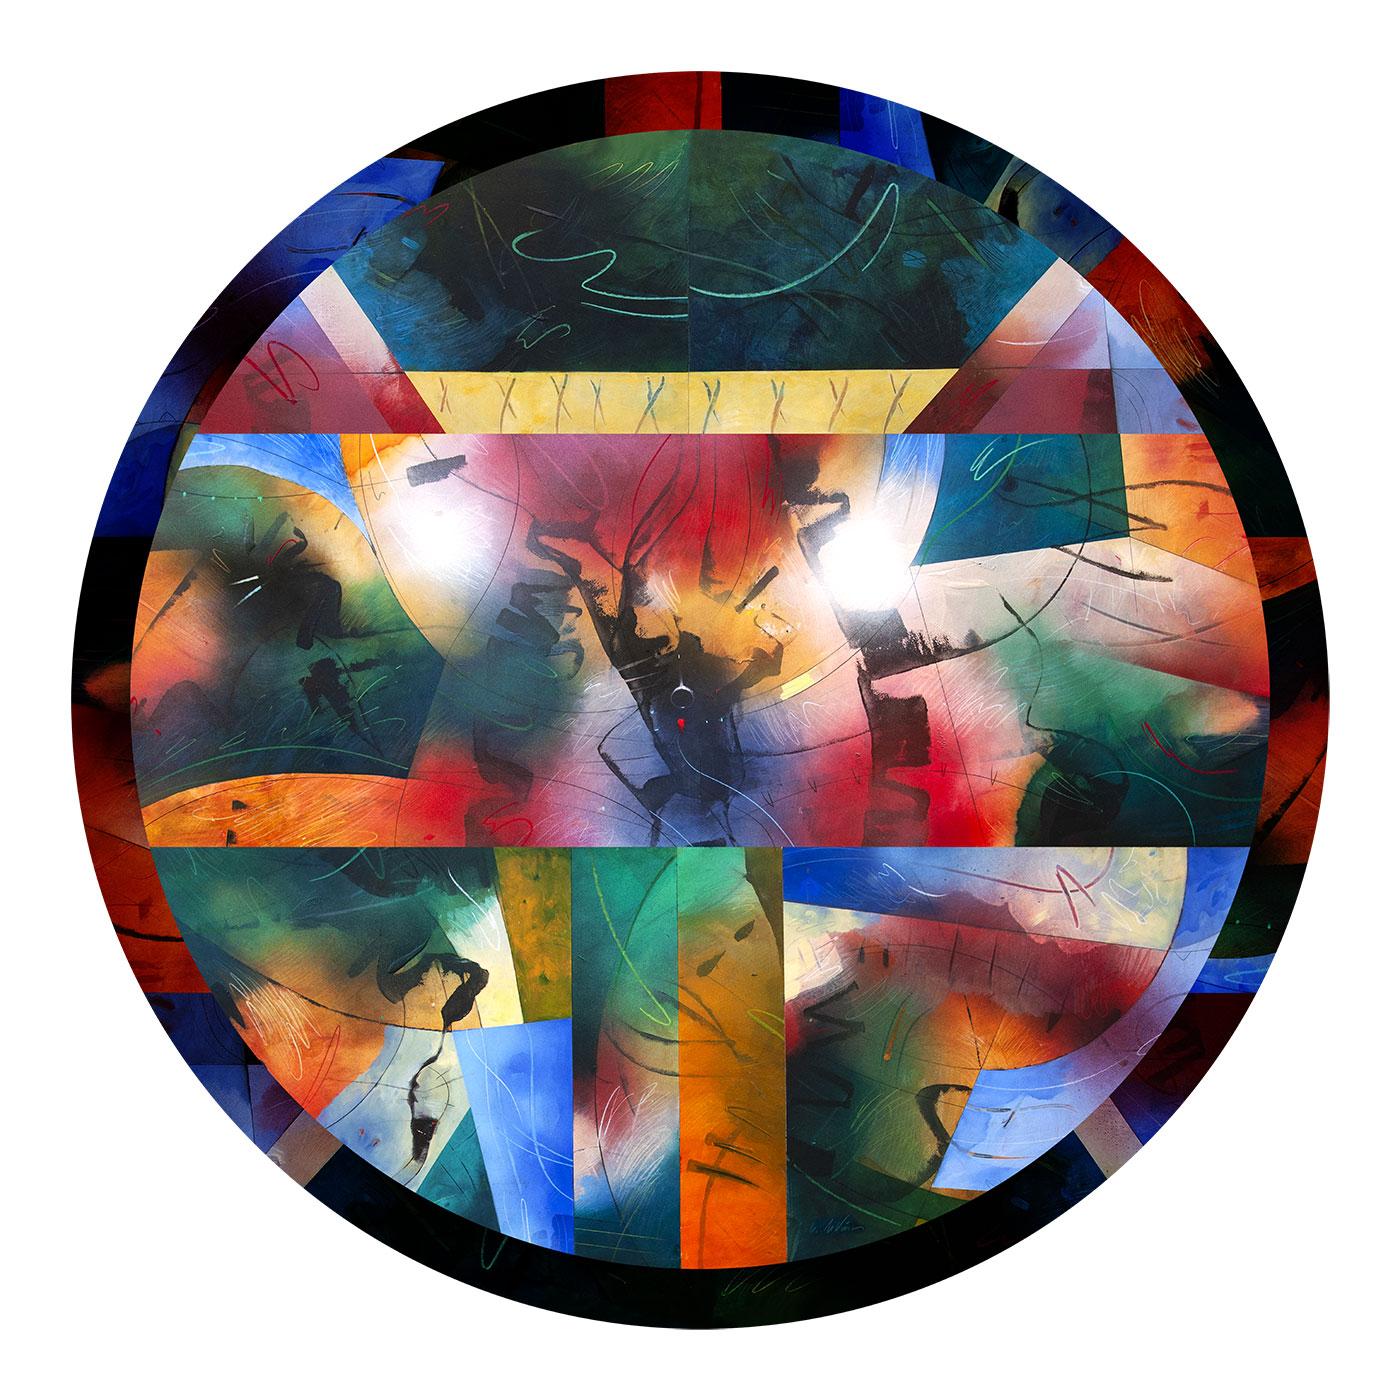 kaleidoscopie-diam-cm90-printed-on-plexiglas- 2020 Private collection